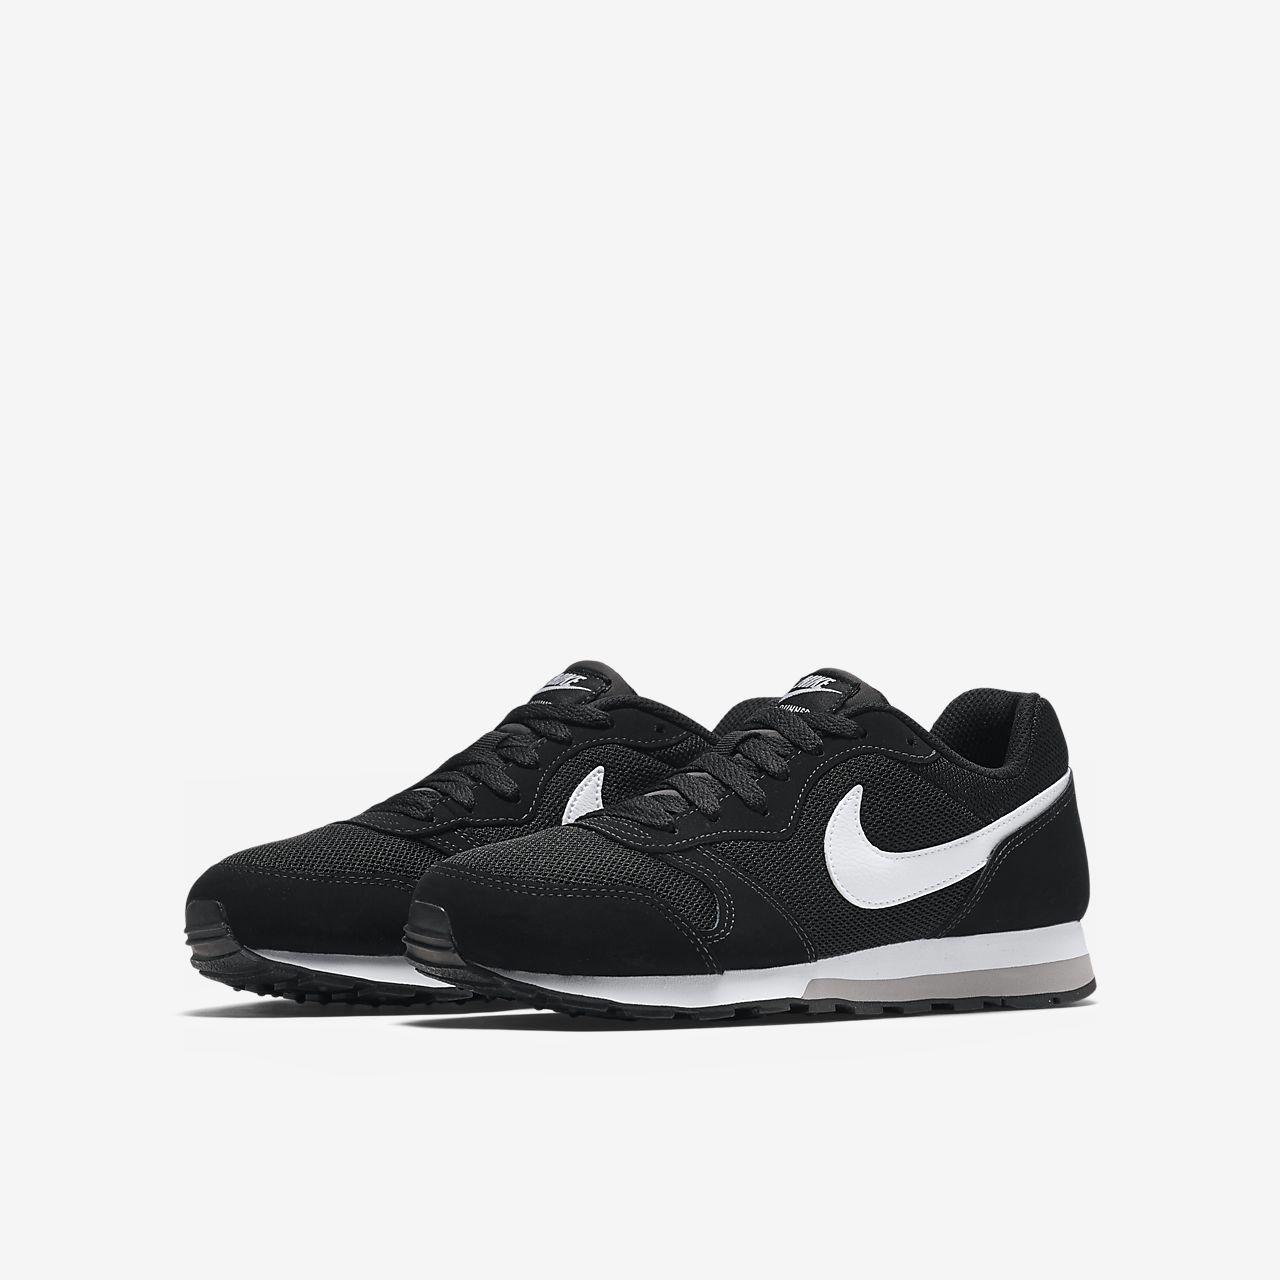 newest 9a81b 87e06 ... Sko Nike MD Runner 2 för ungdom